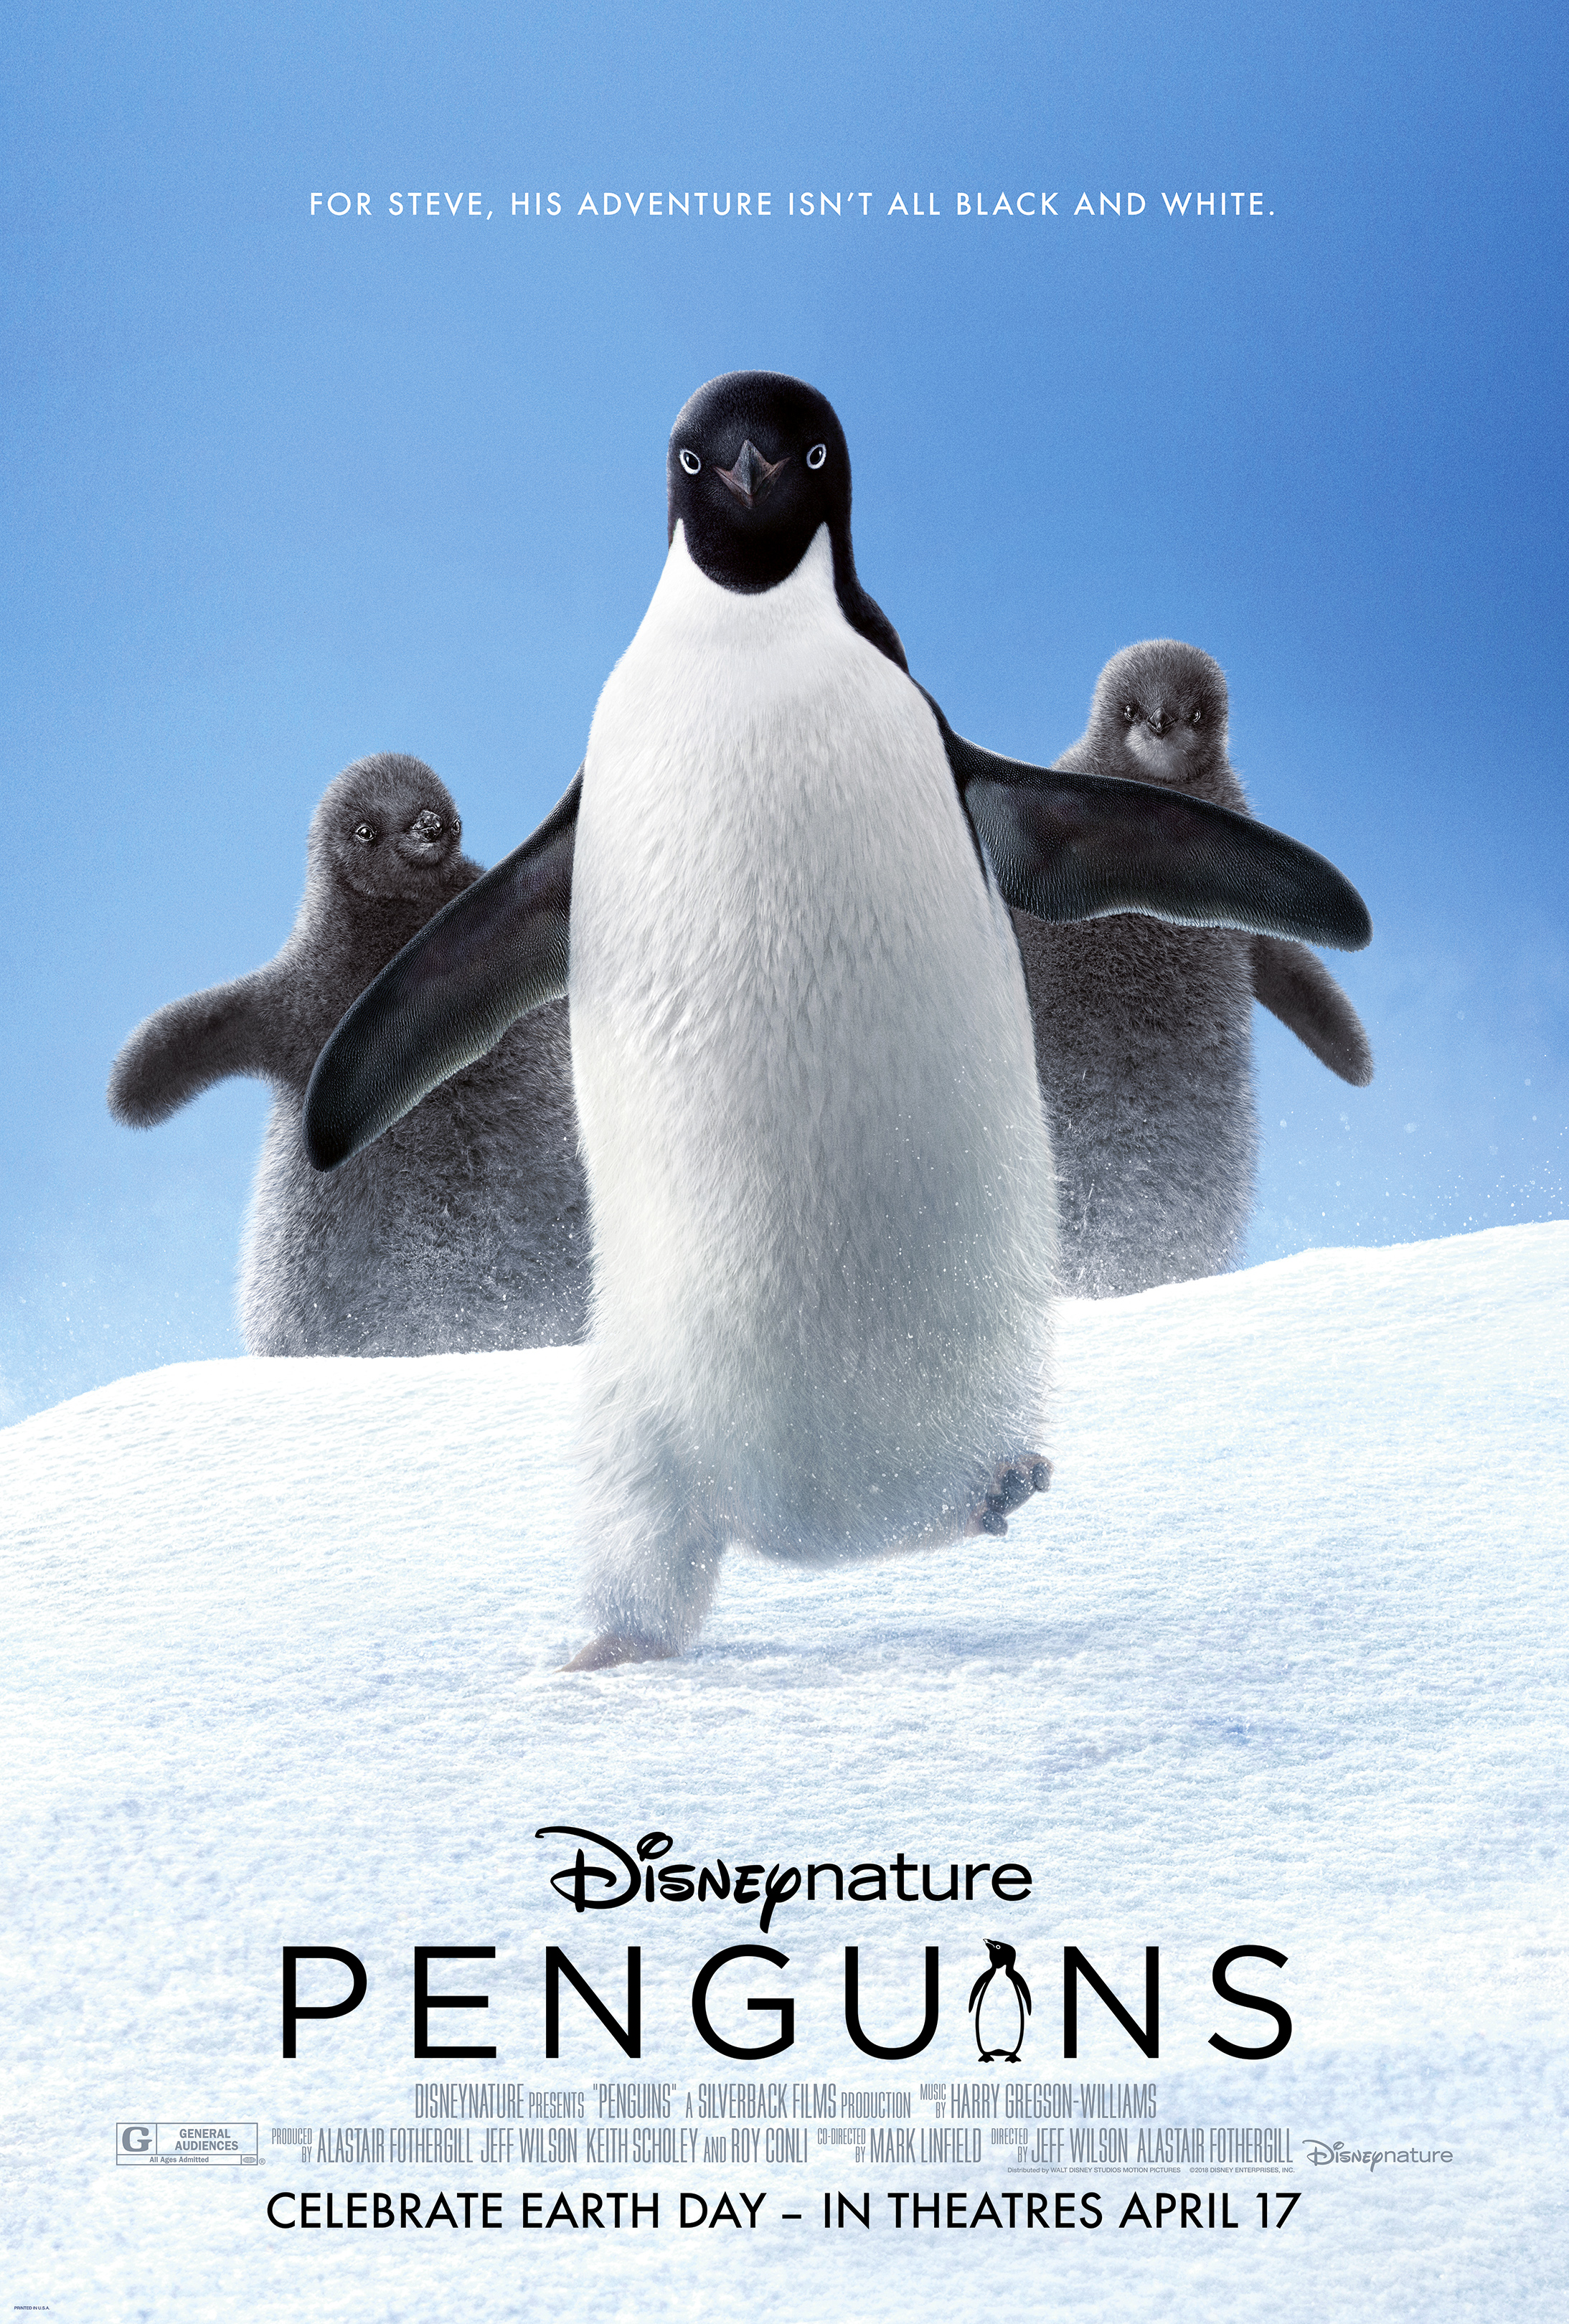 Penguins (Disneynature)